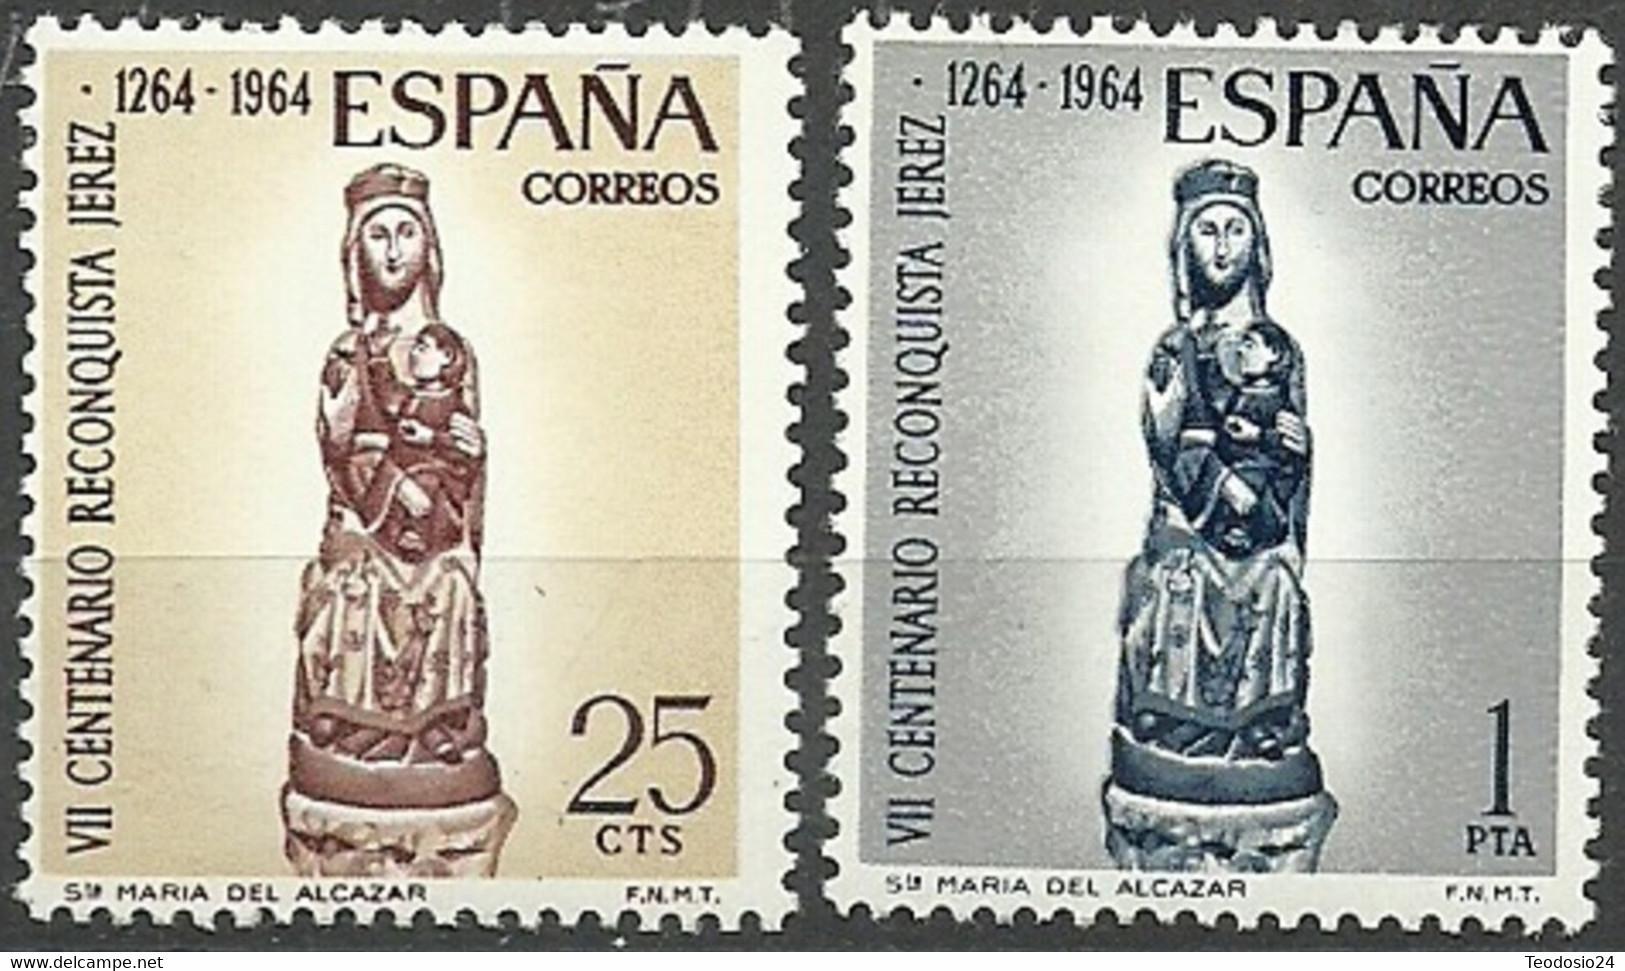 España 1964 ** Edifil 1615/1616** Mnh VII Aniversario Reconquista De Jerez. - 1931-Hoy: 2ª República - ... Juan Carlos I